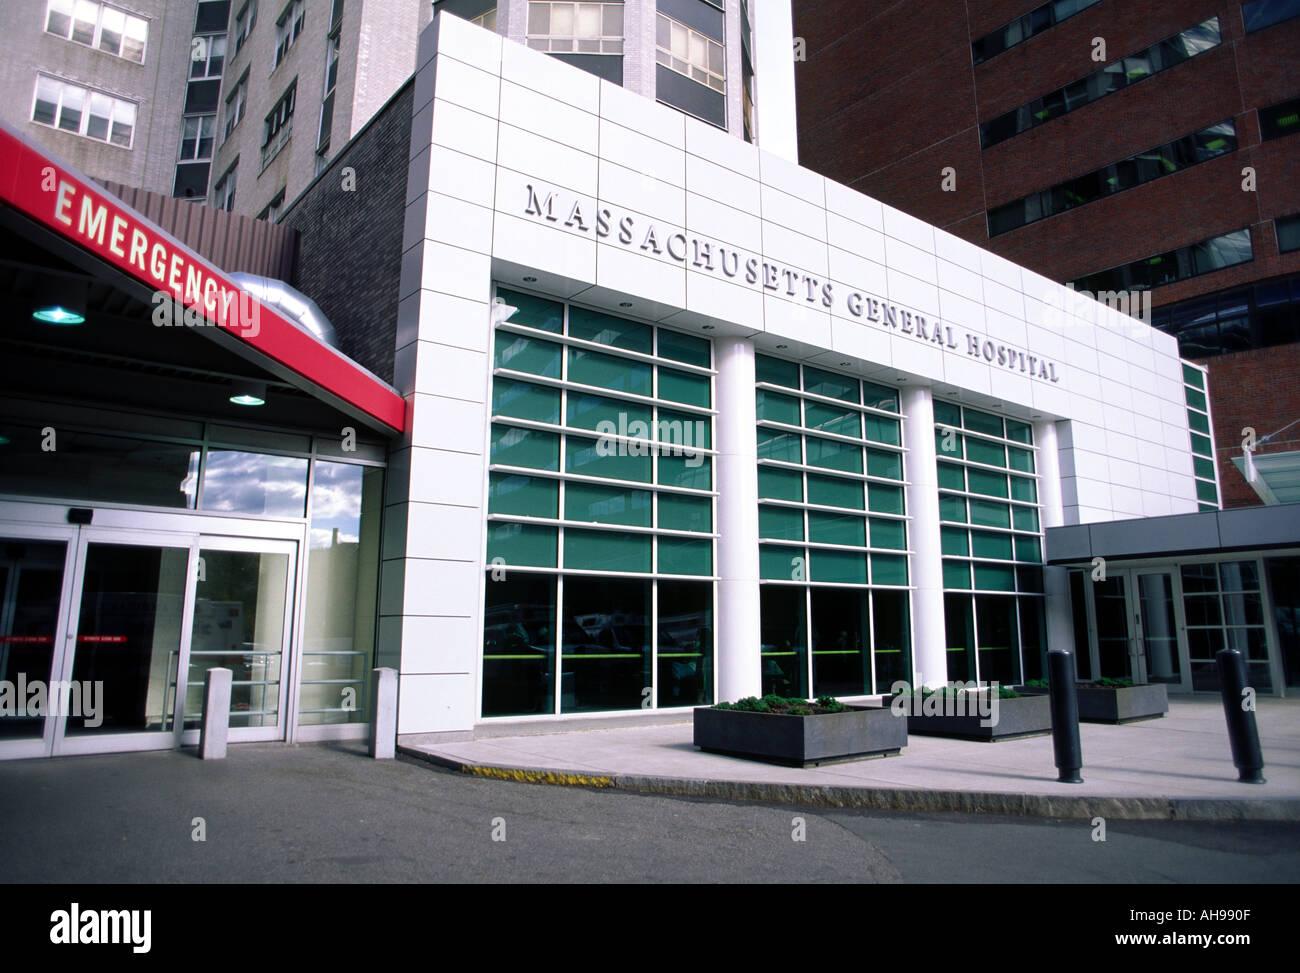 Massachusetts General Hospital Stock Photos & Massachusetts General